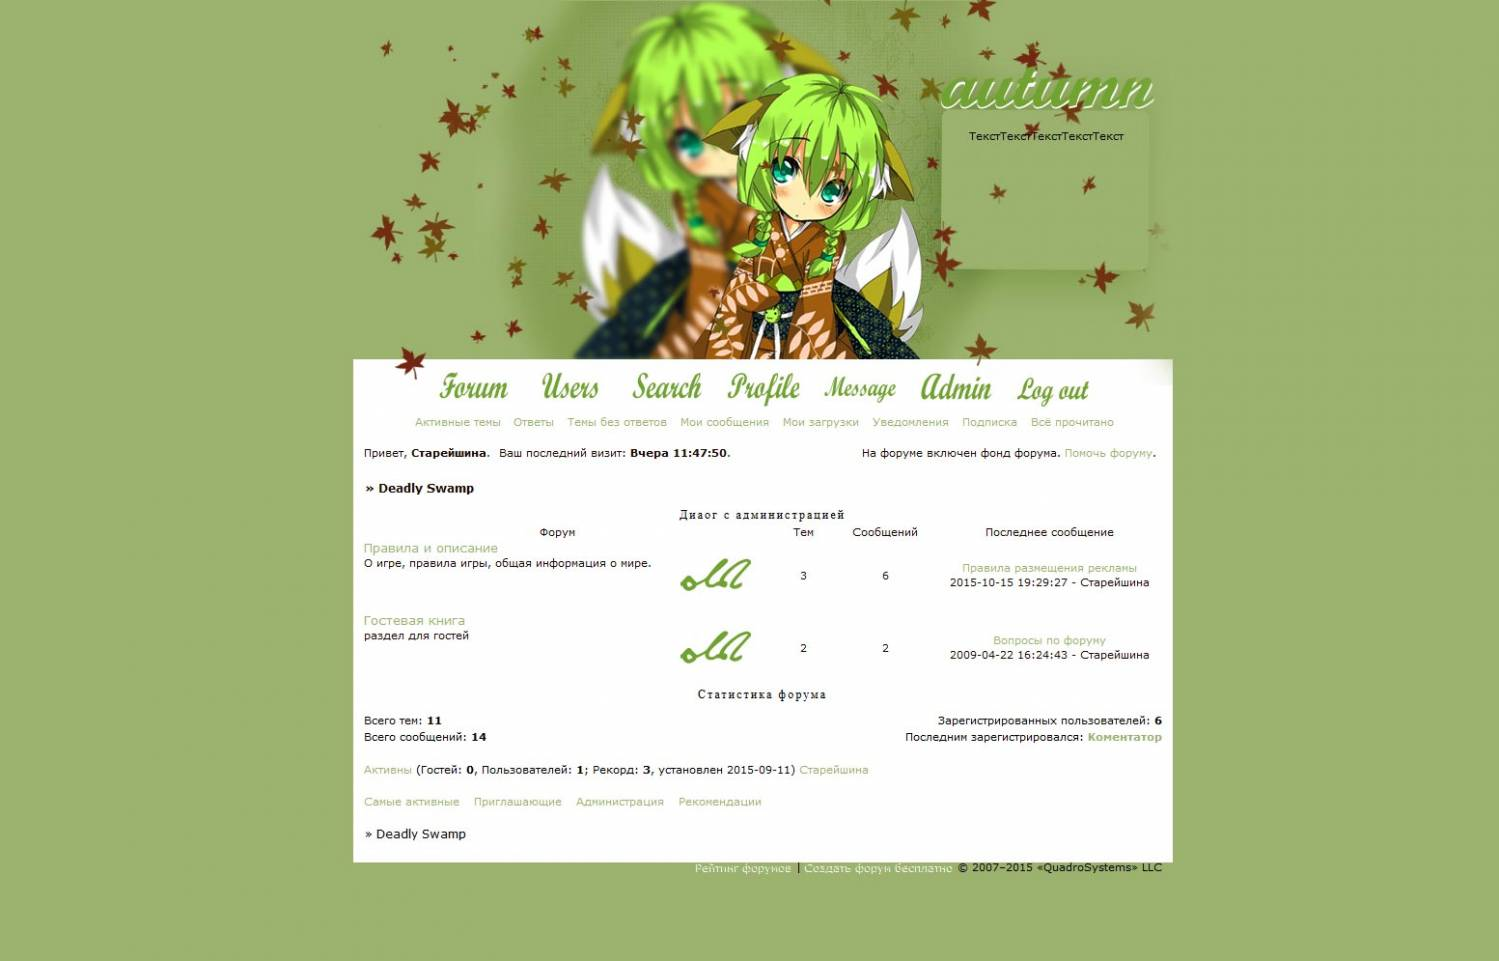 http://gerda.moy.su/_ld/1/81556712.jpg